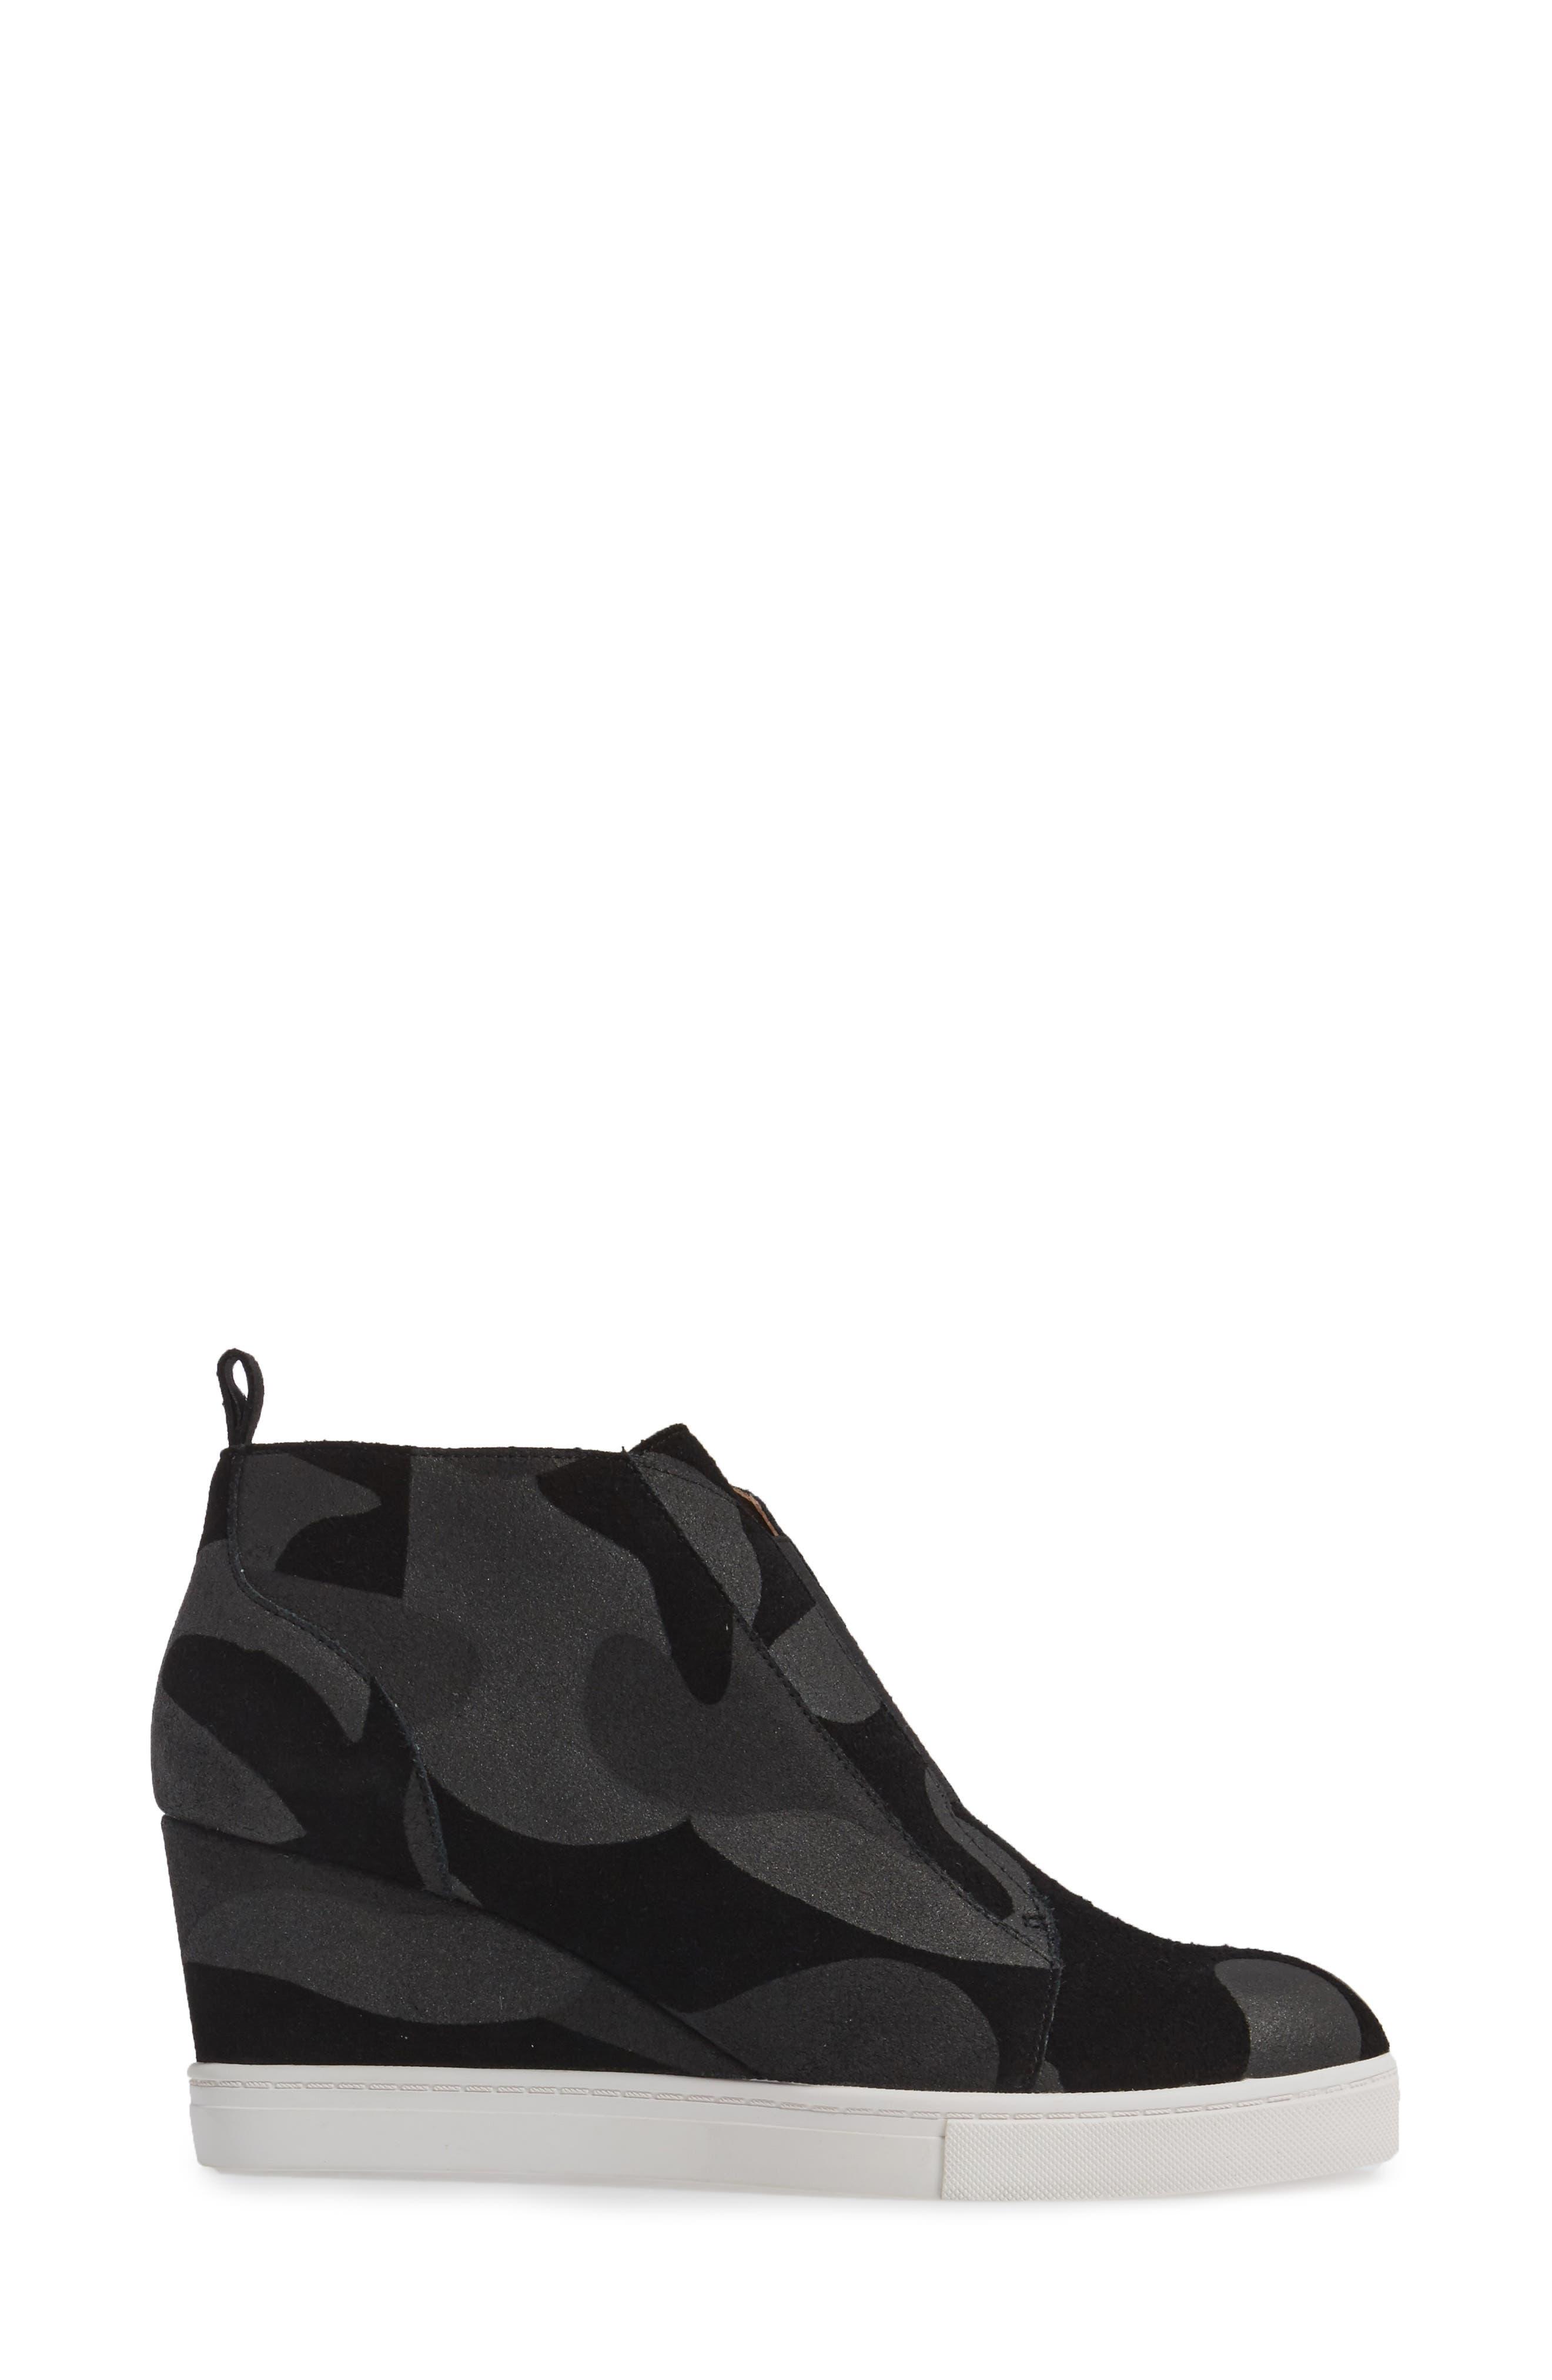 'Felicia' Wedge Bootie,                             Alternate thumbnail 3, color,                             Black/ Dark Grey Print Suede